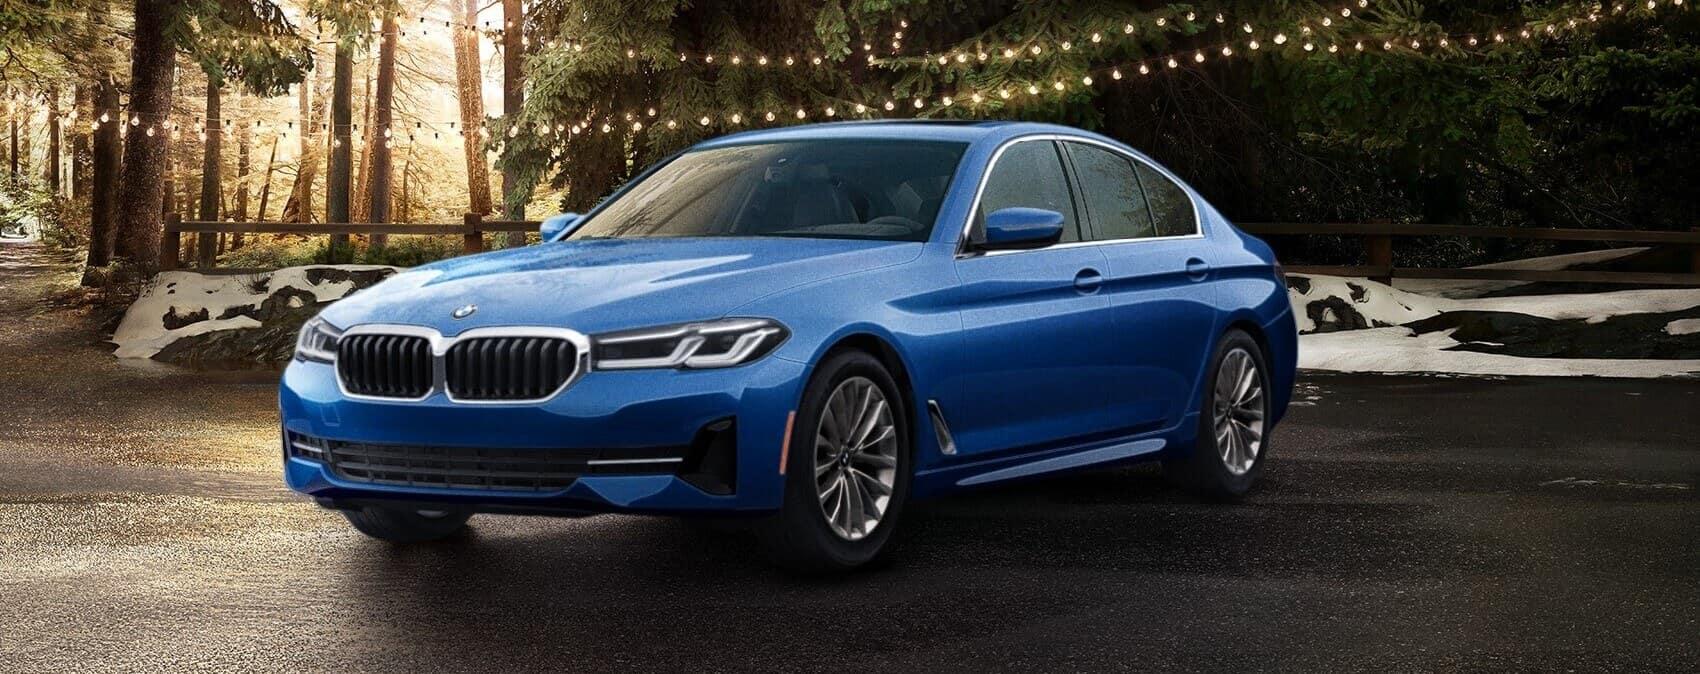 BMW 3 Series vs BMW 5 Series